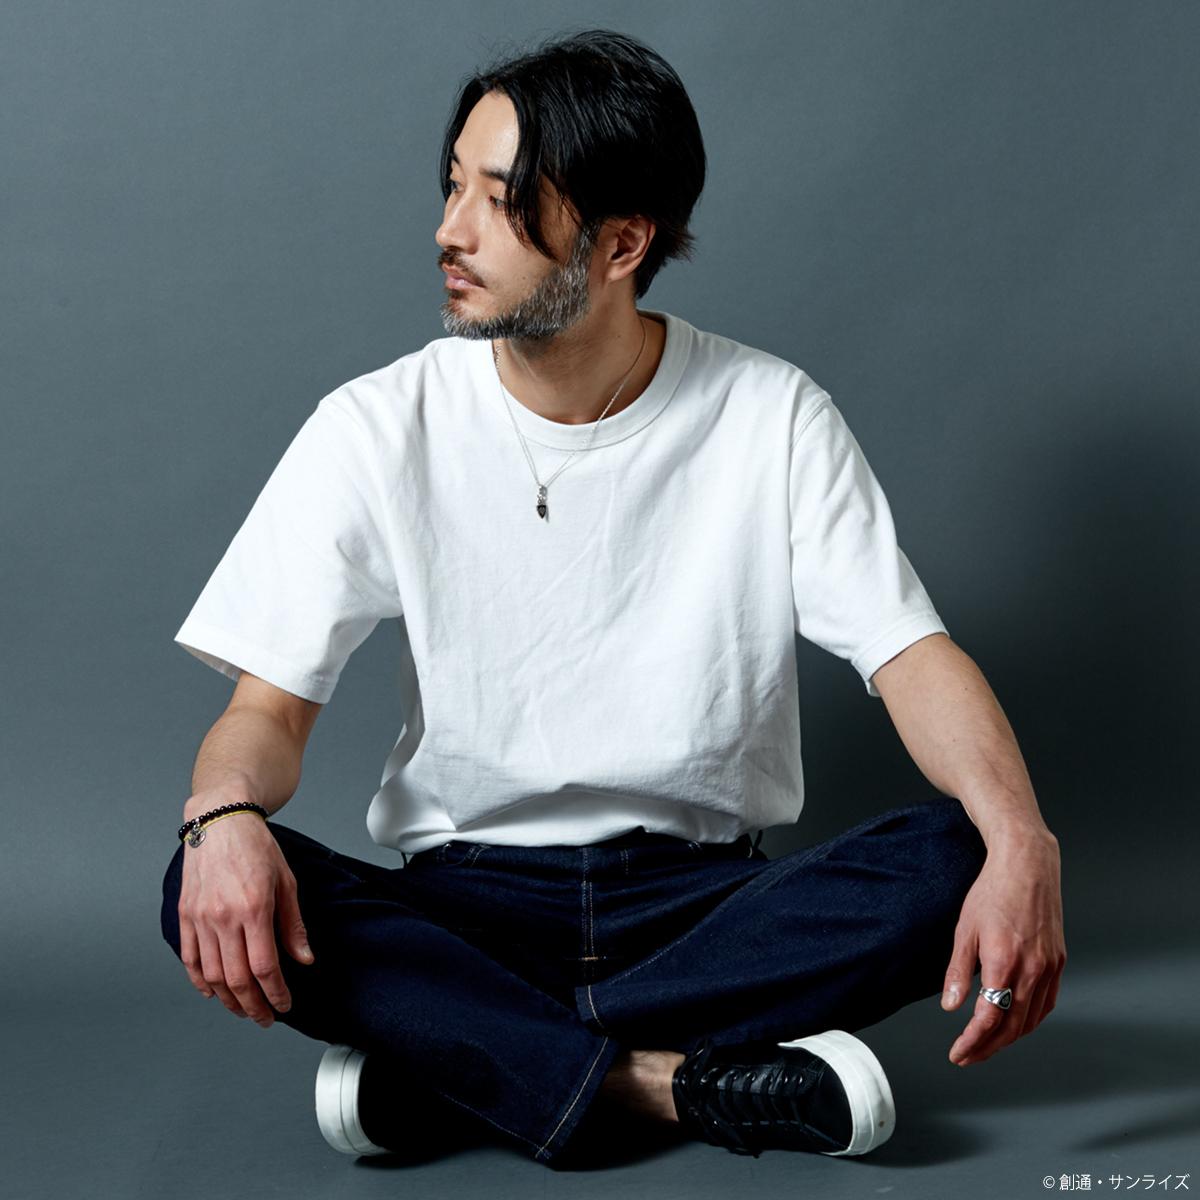 STRICT-G EDWIN 『機動戦士ガンダム』JERSEYS レギュラーストレート E.F.S.F.